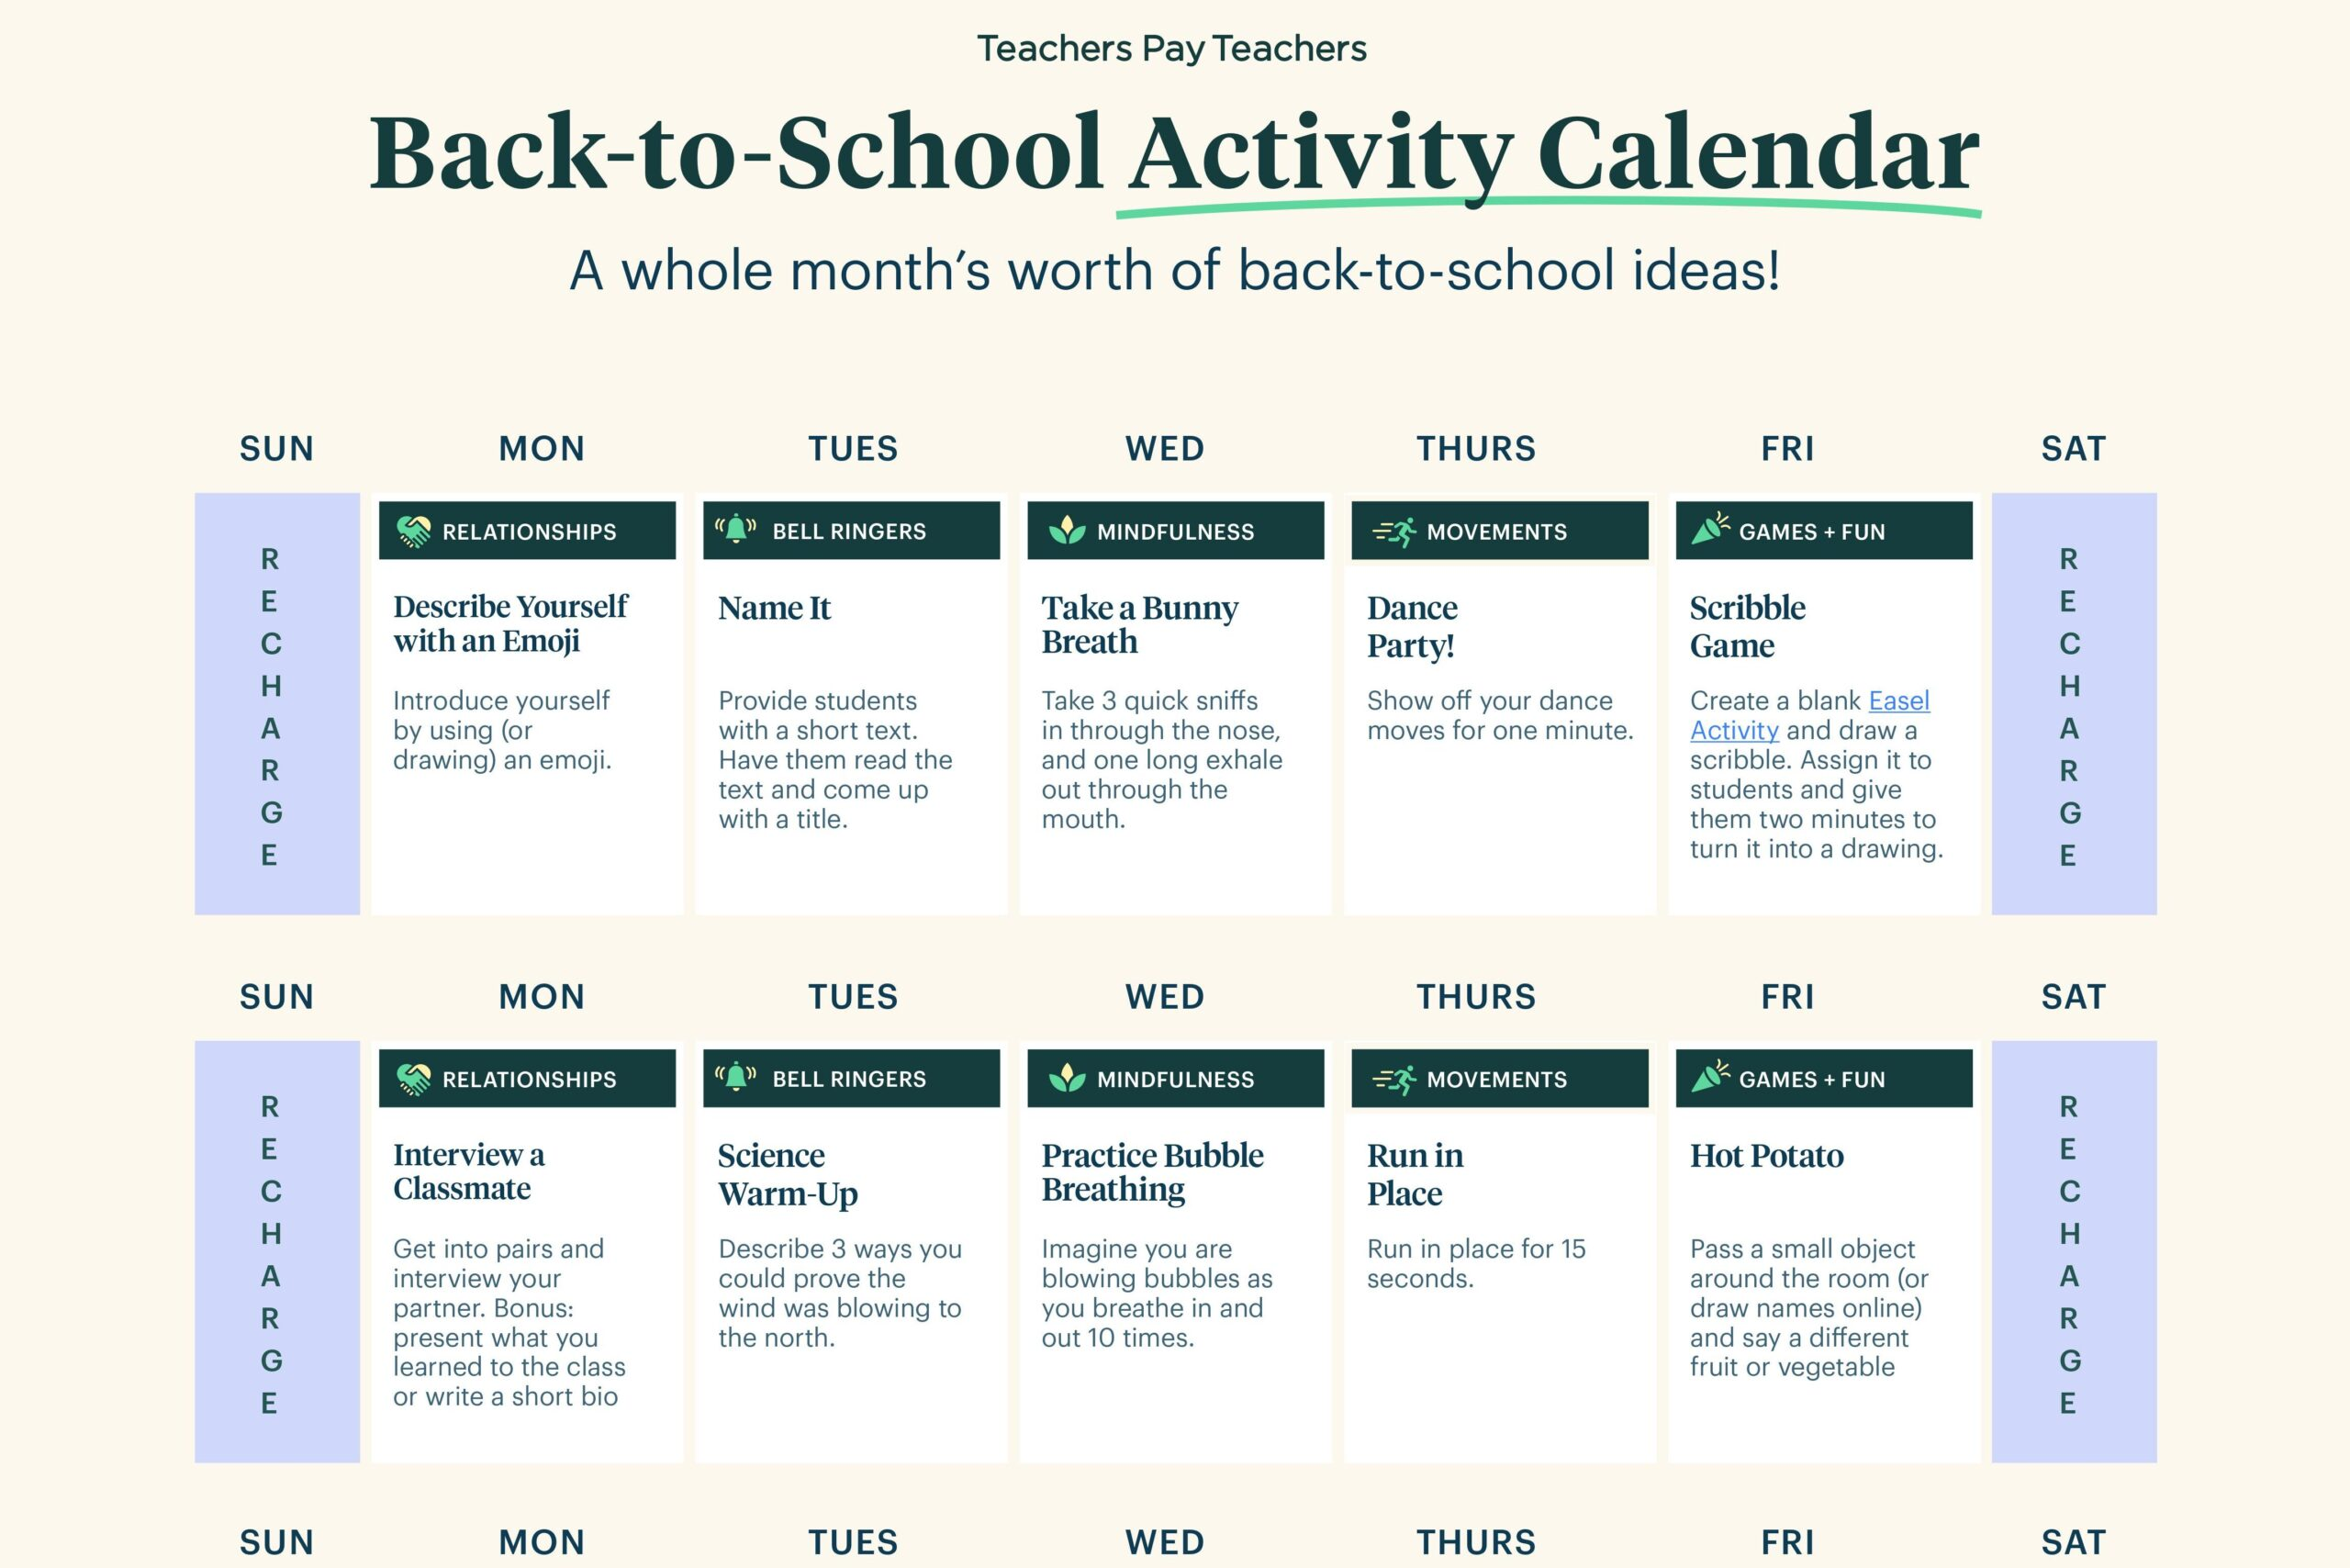 Back-to-School Activity Calendar